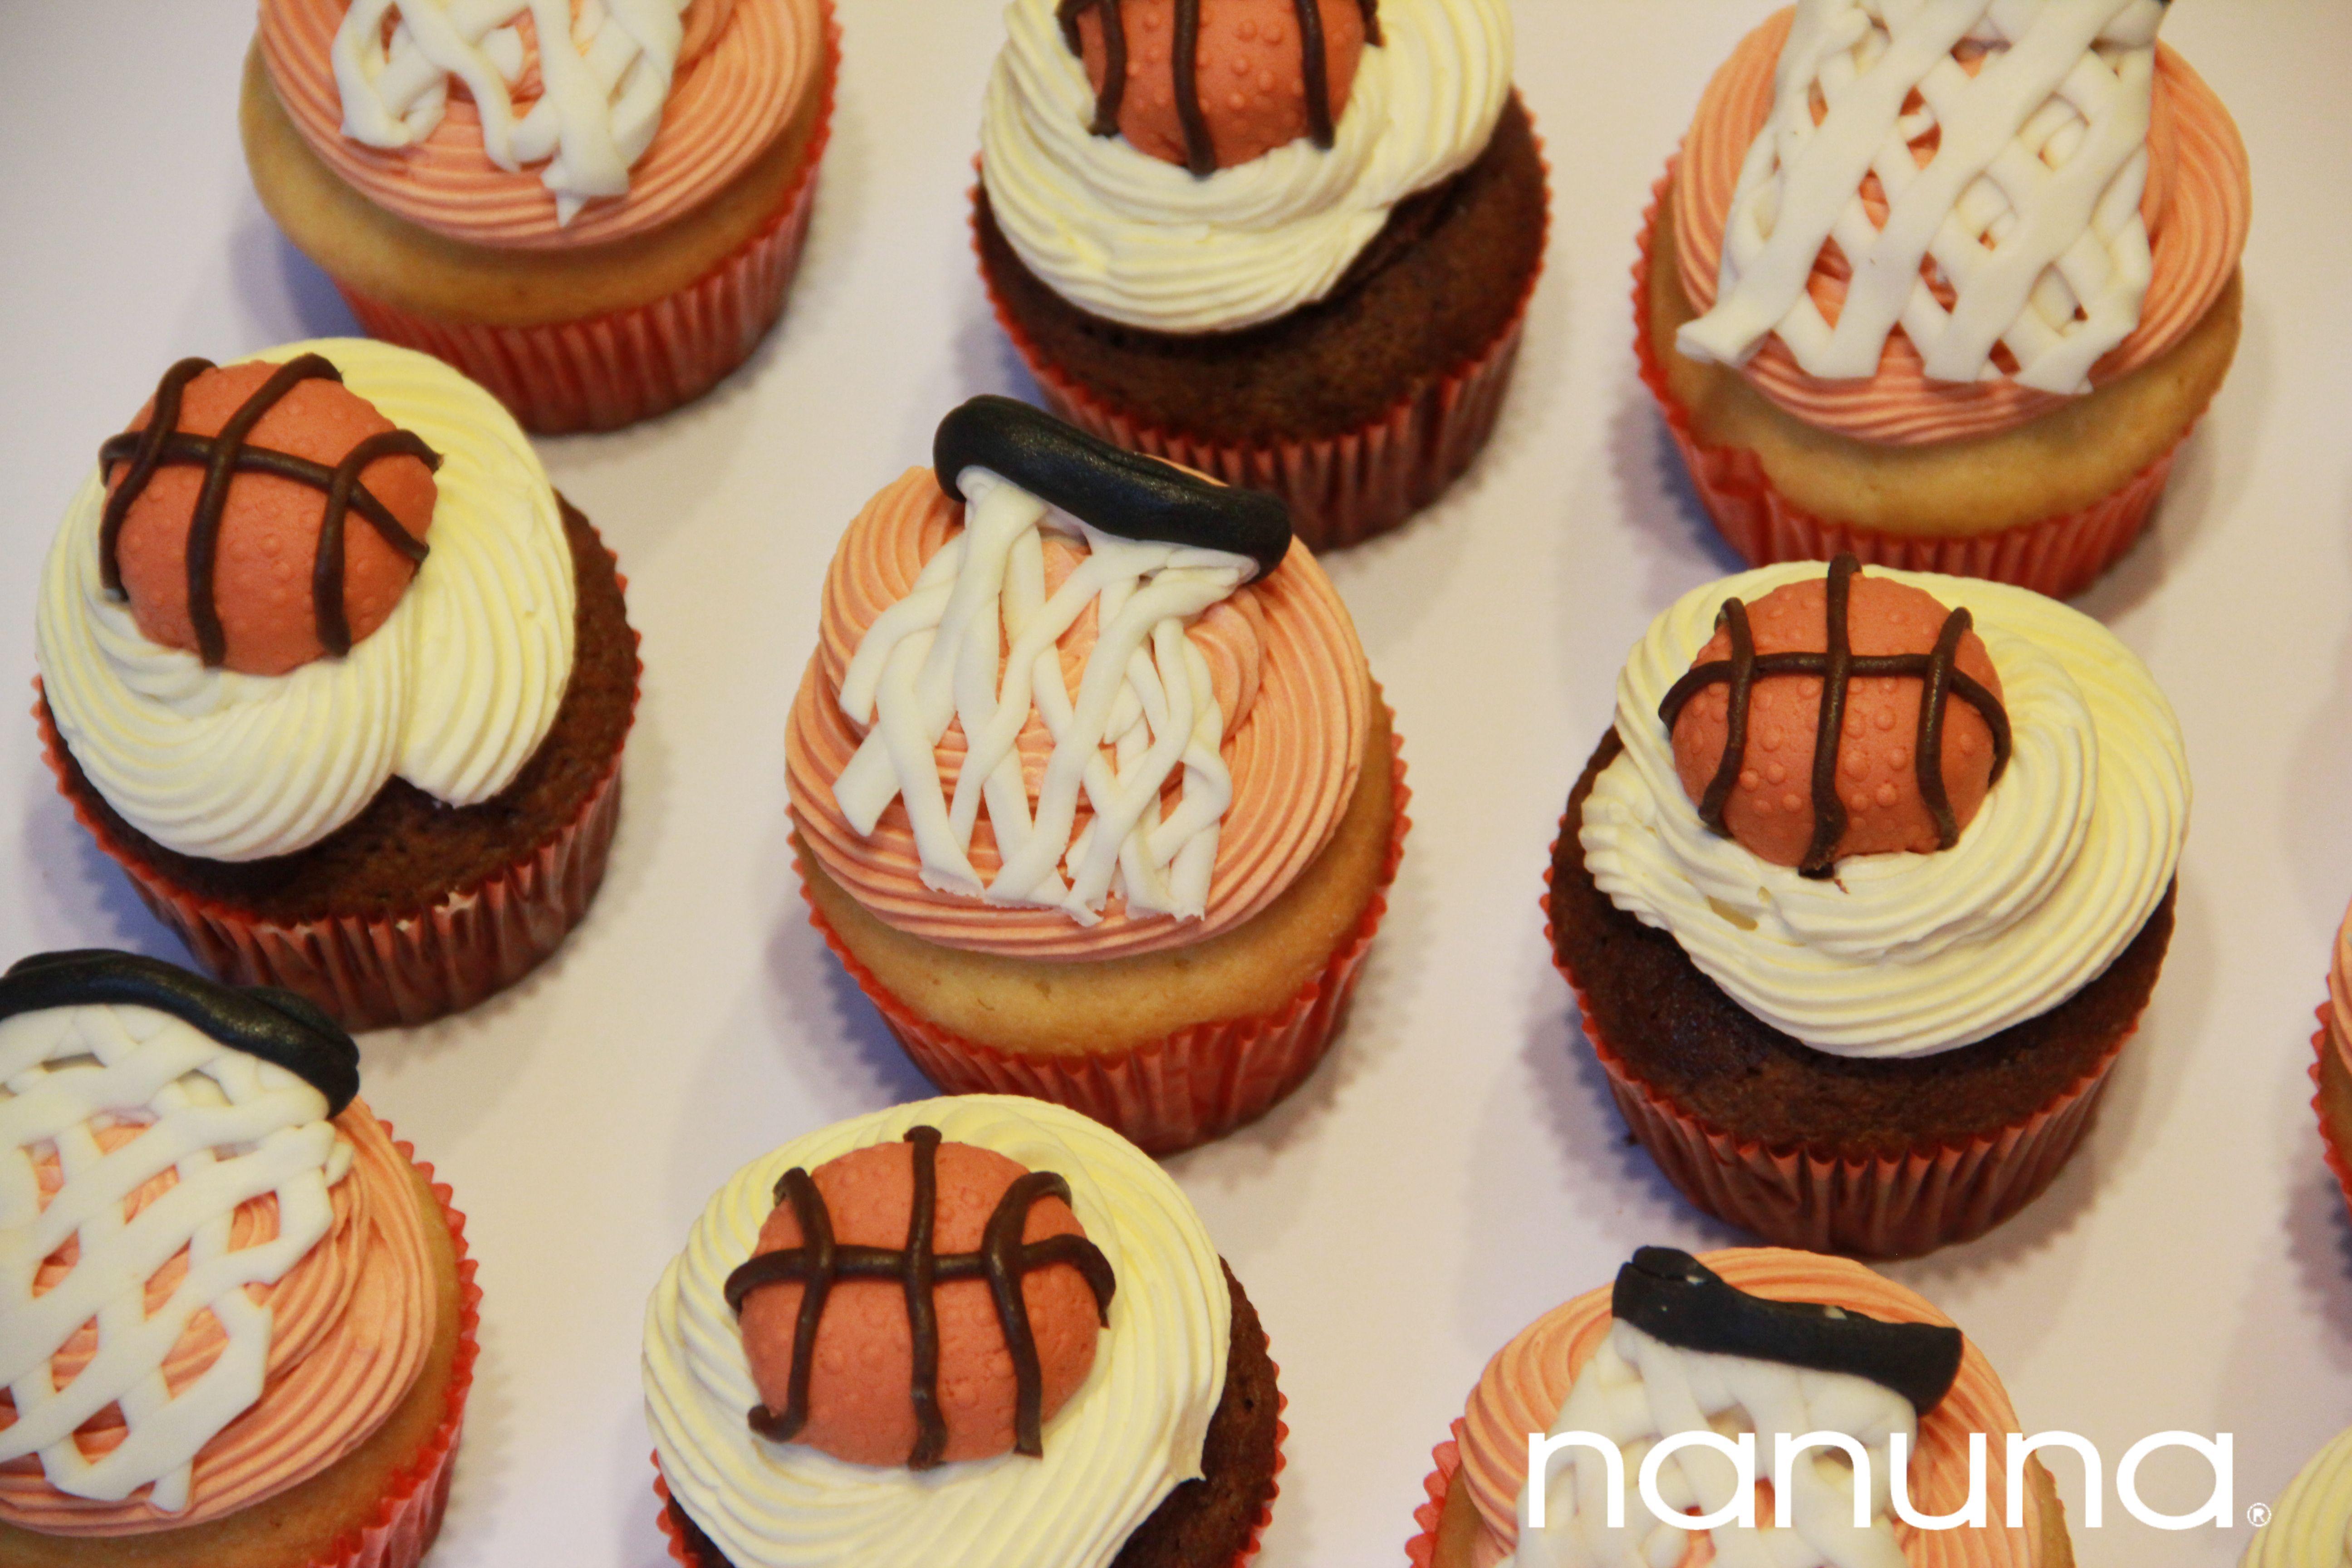 Cupcakes basquet Cupcakes Tortas Argentina Nanuna Conocenos